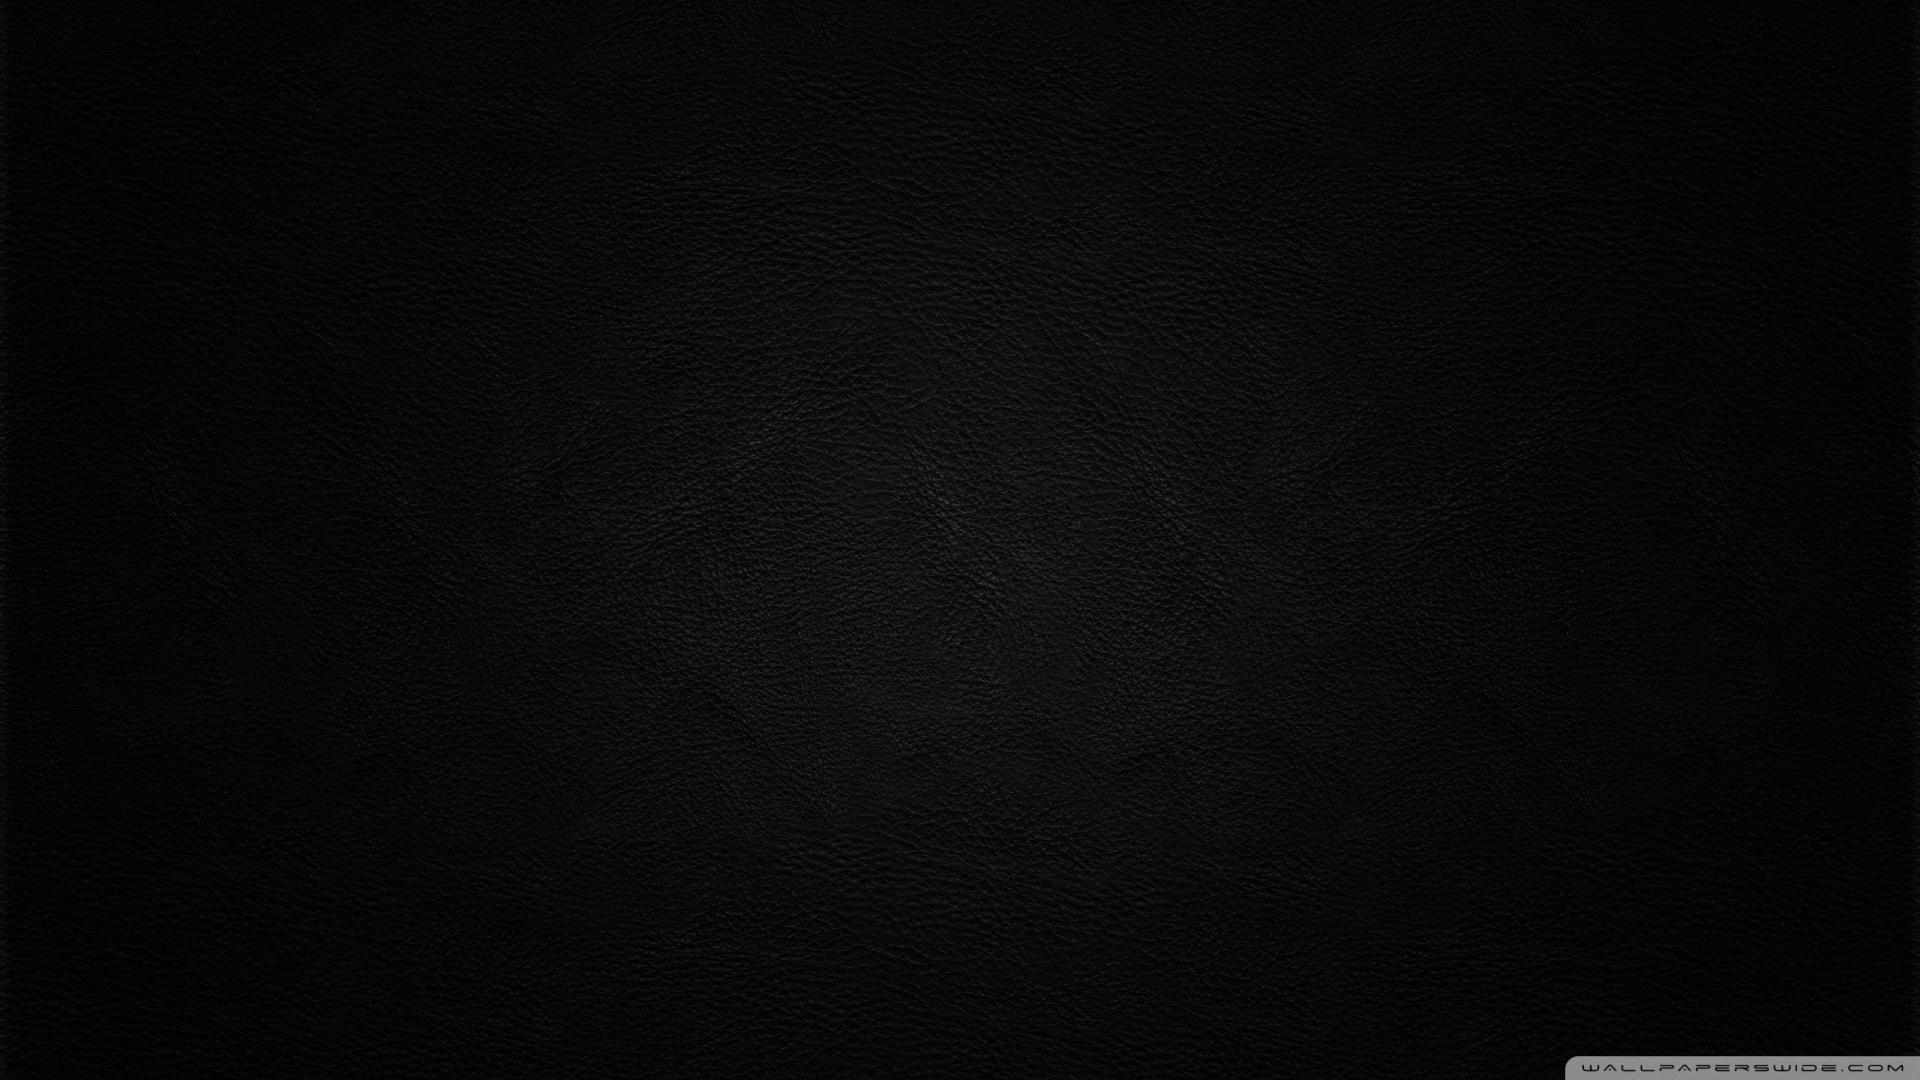 Black Background Leather Wallpaper 1920x1080 Black Background 1920x1080